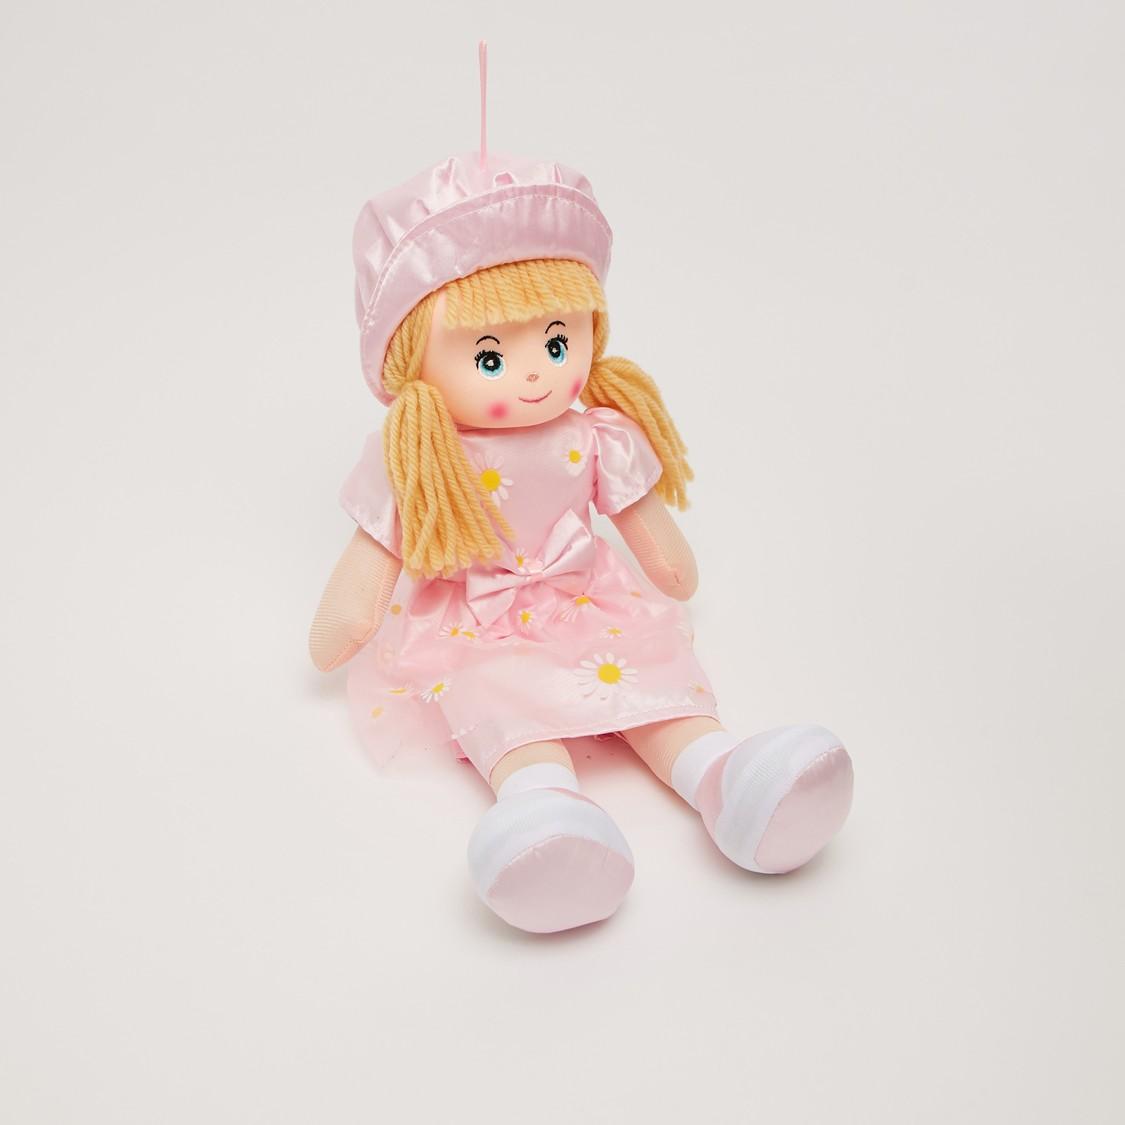 All-Over Print Dress Rag Doll